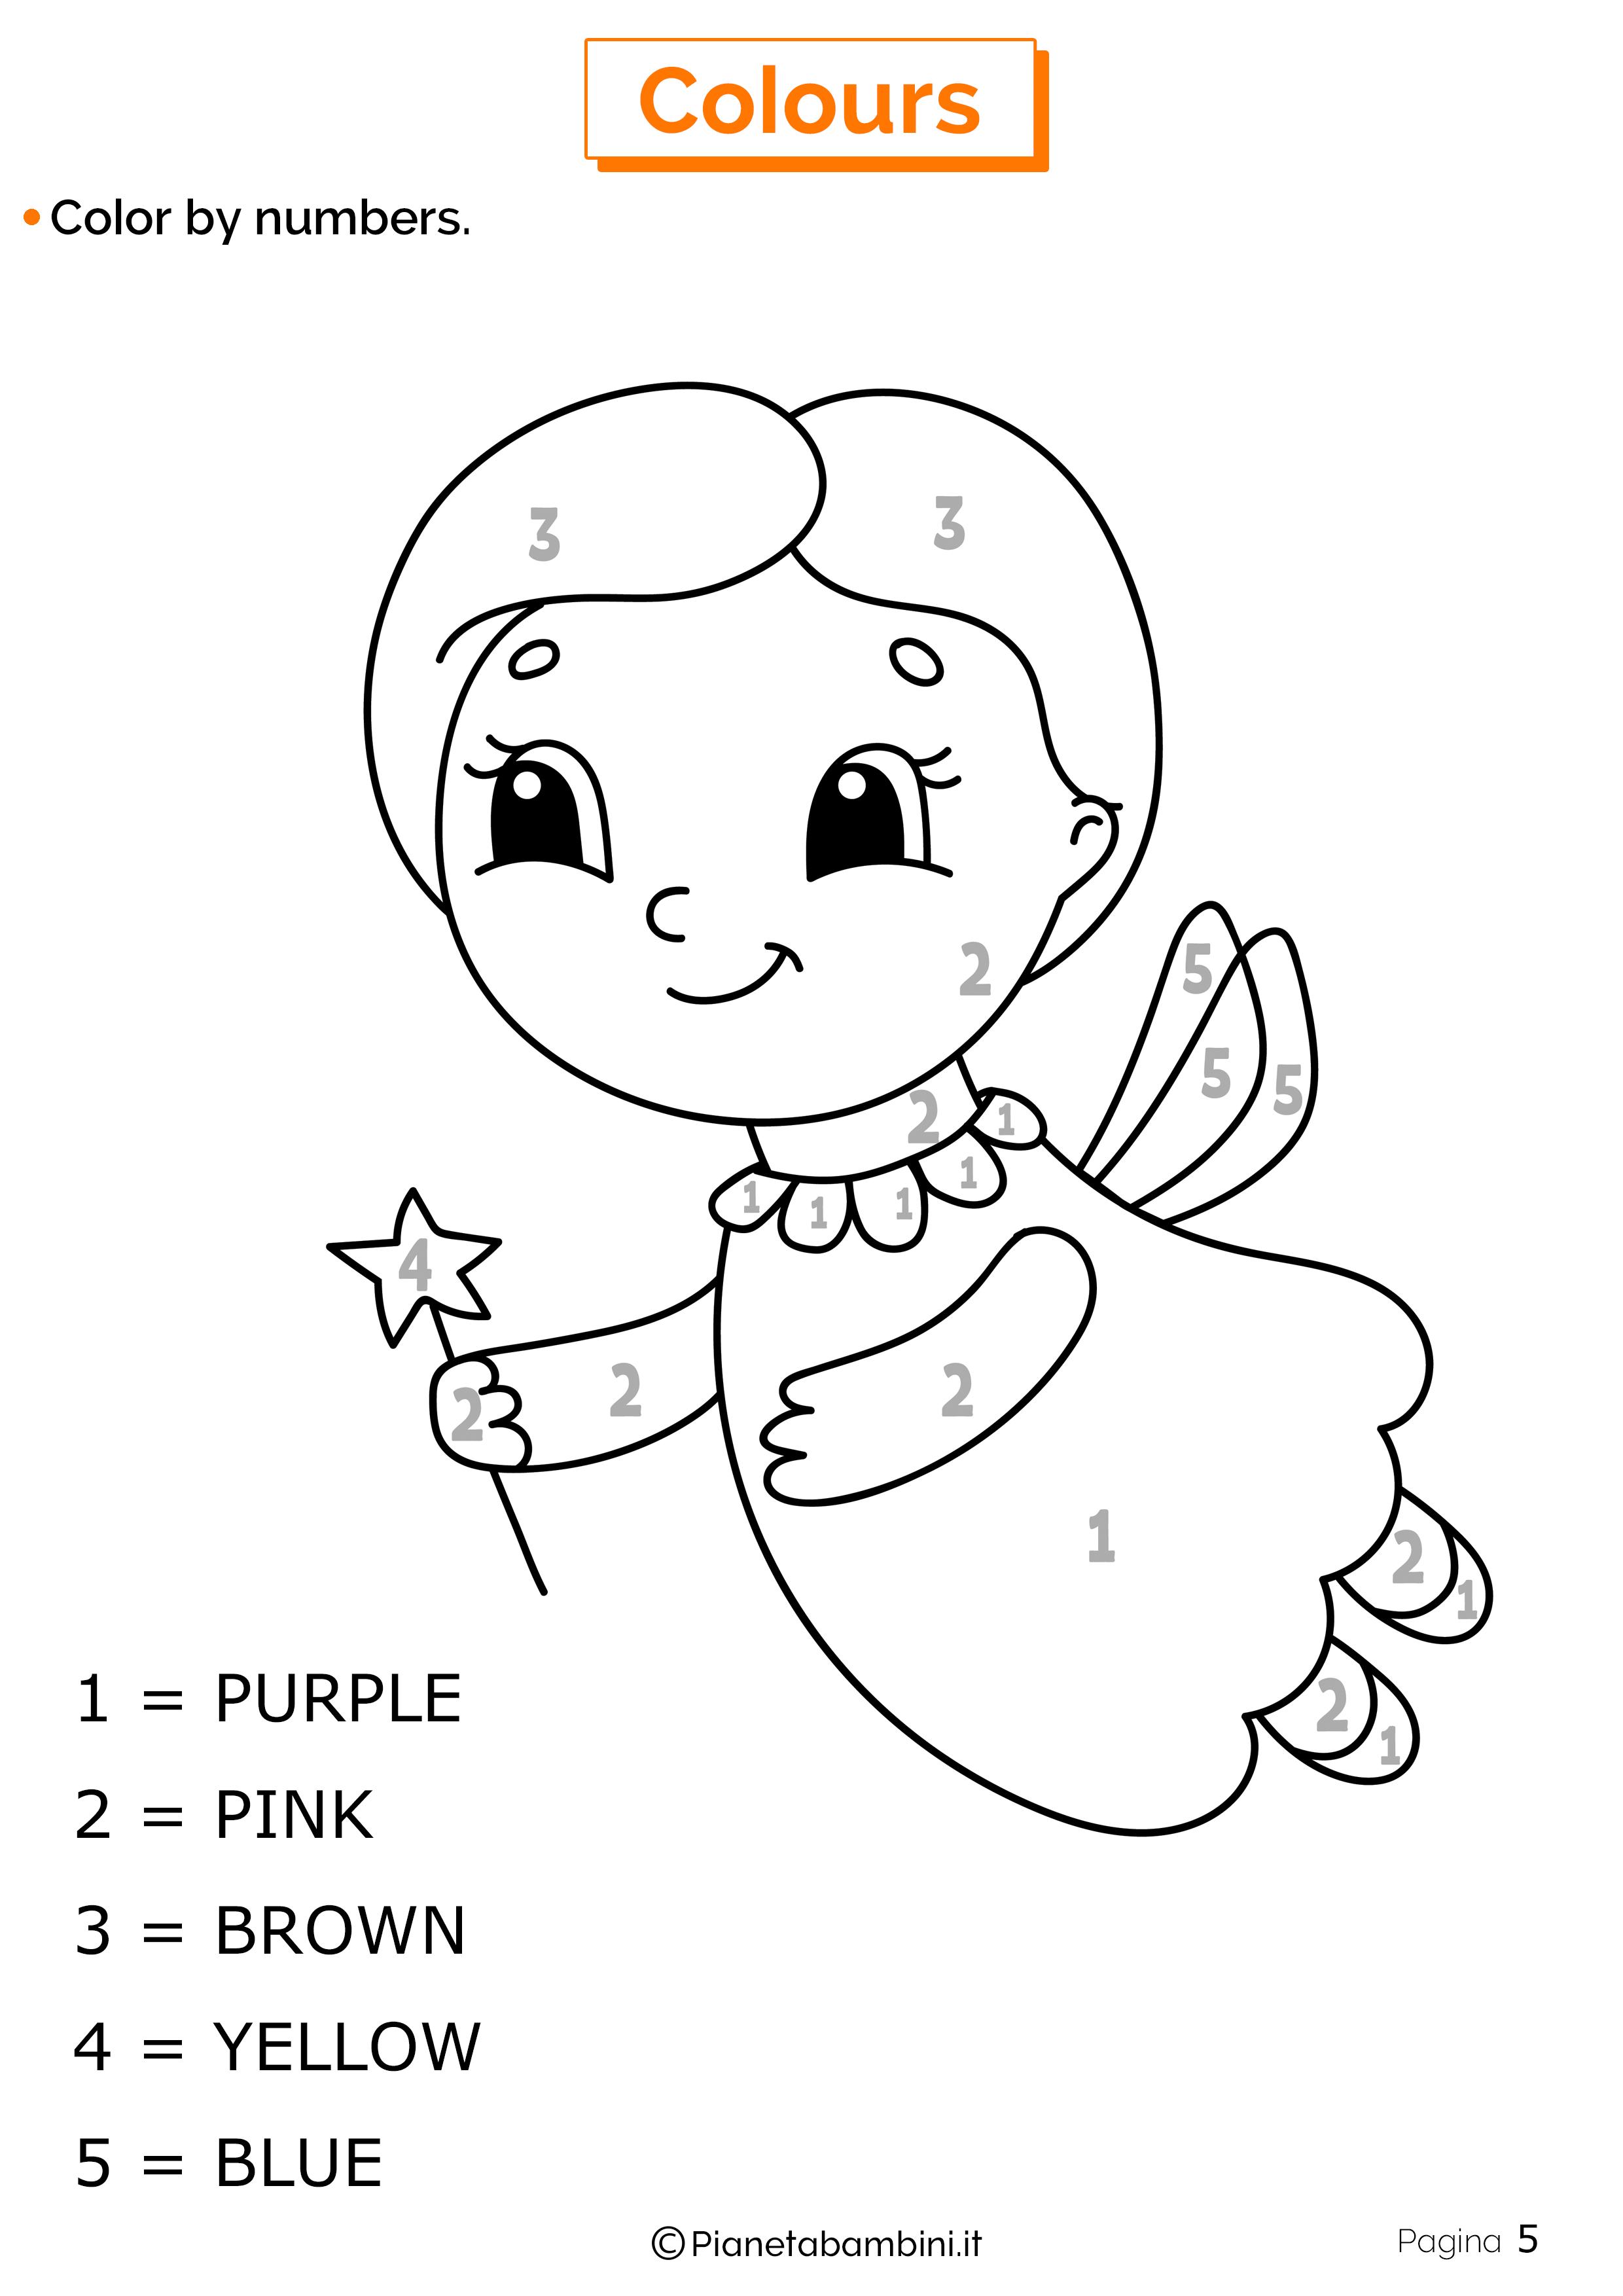 Scheda sui colori in inglese 5